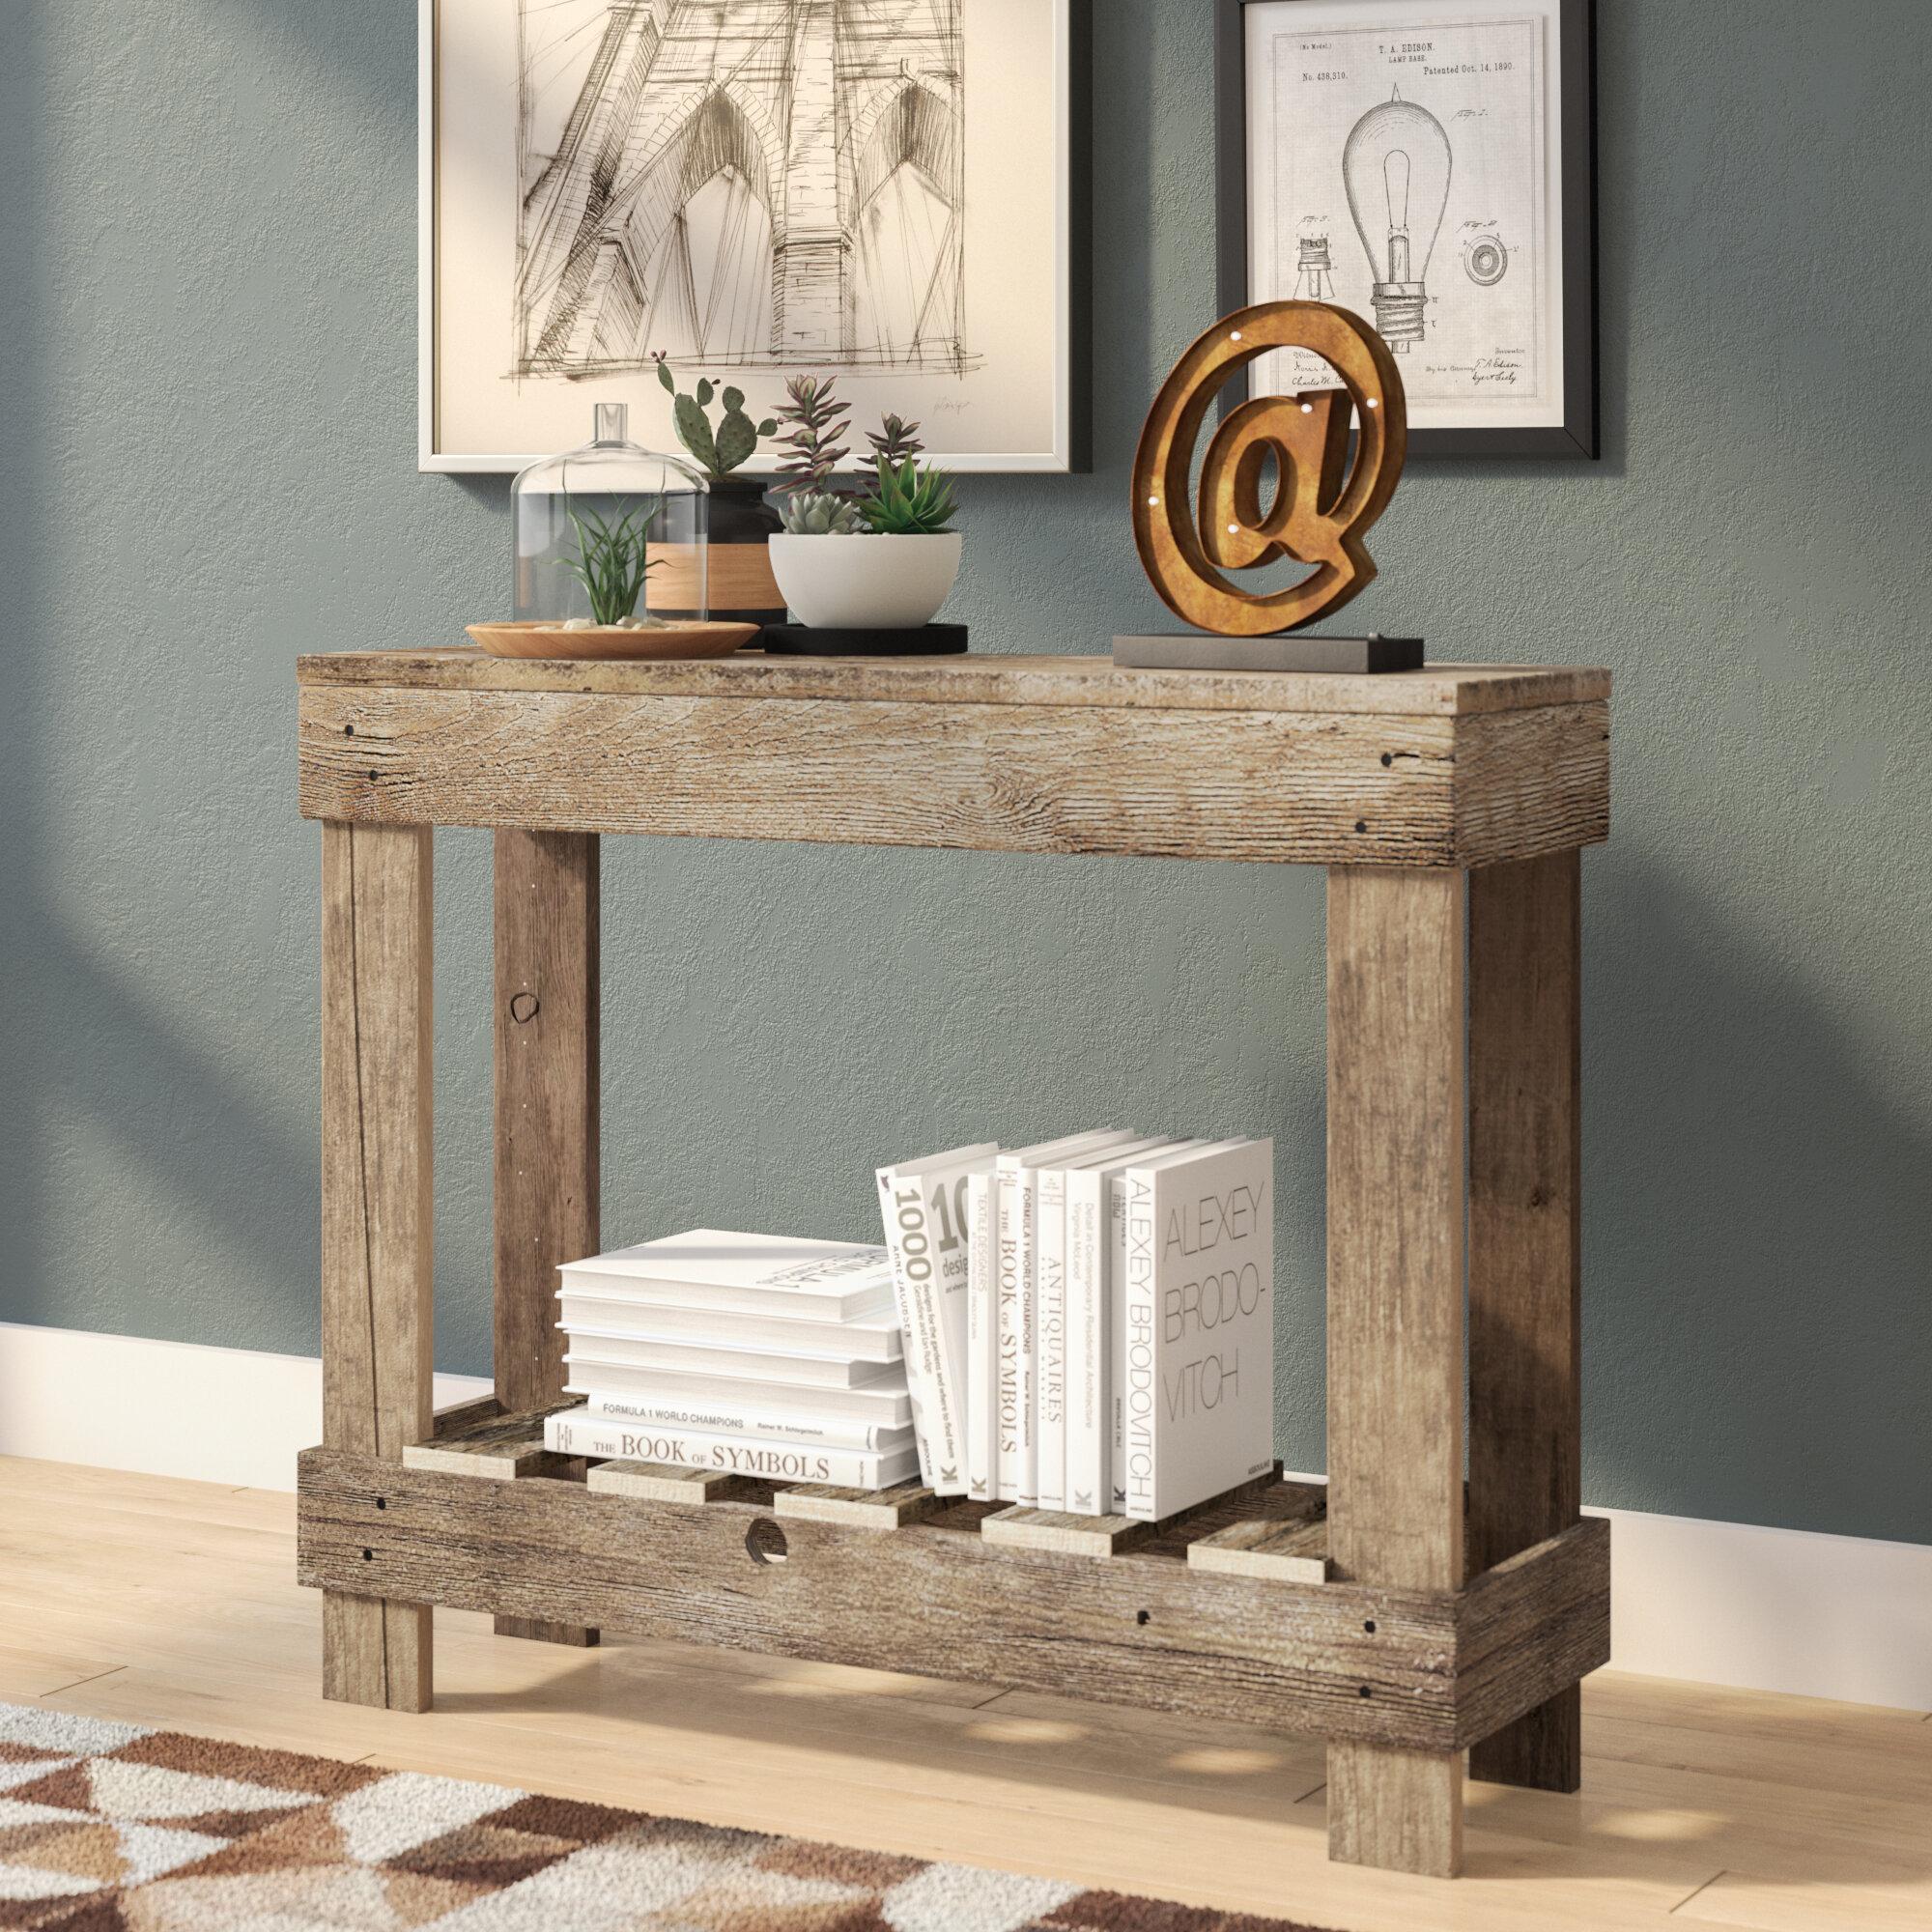 table newport concepts prod hei furniture p tables v qlt convenience wid console